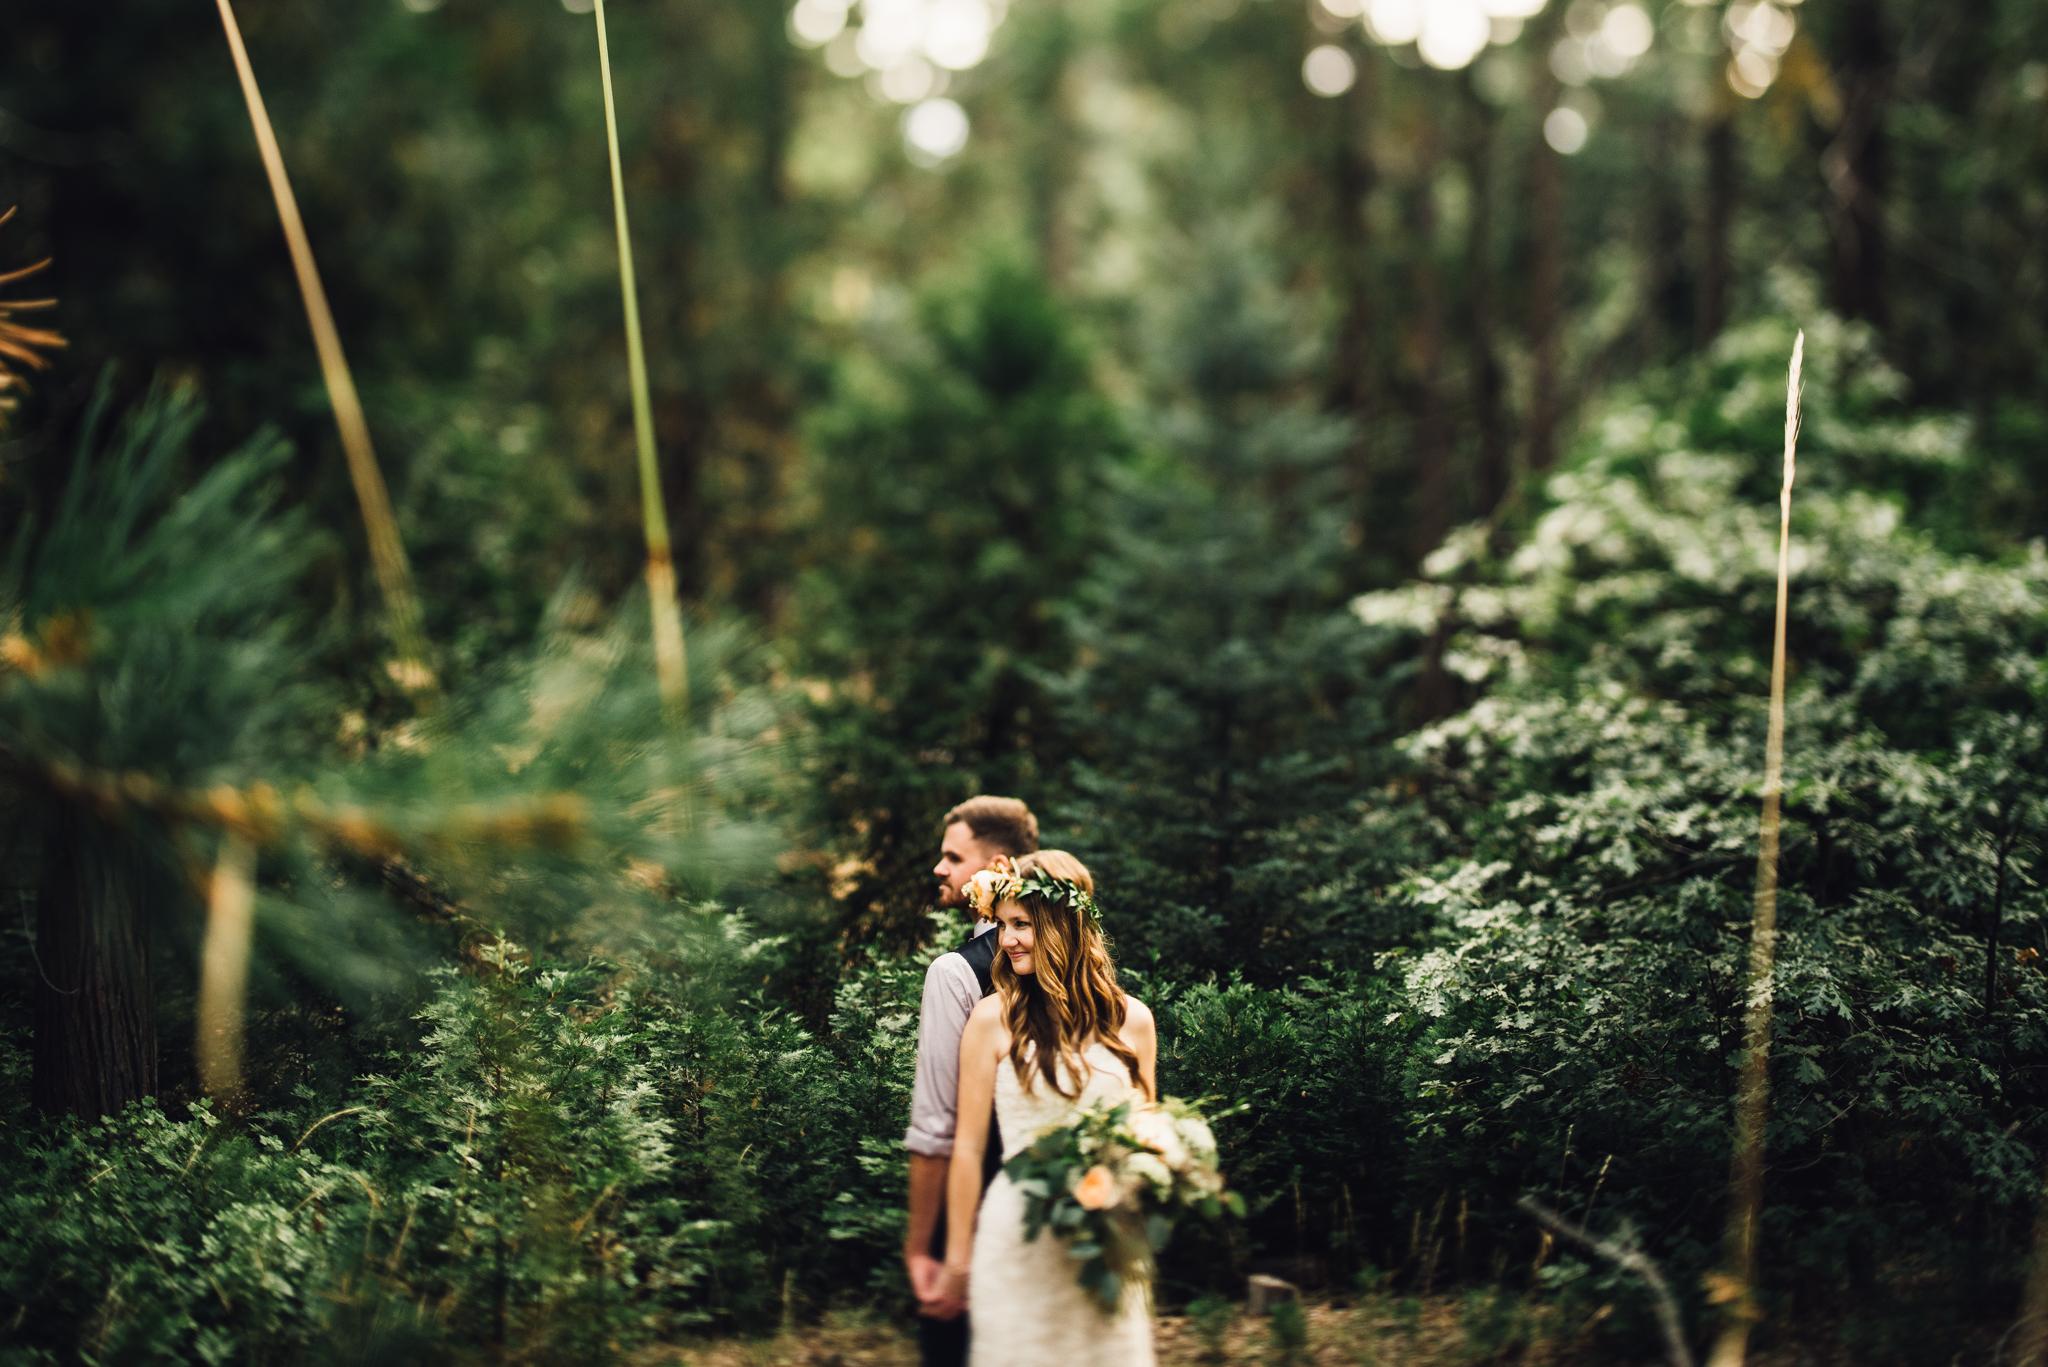 ©Isaiah & Taylor Photography - Pine Rose Cabin - Lake Arrowhead - Los Angeles Wedding Photographer-083.jpg